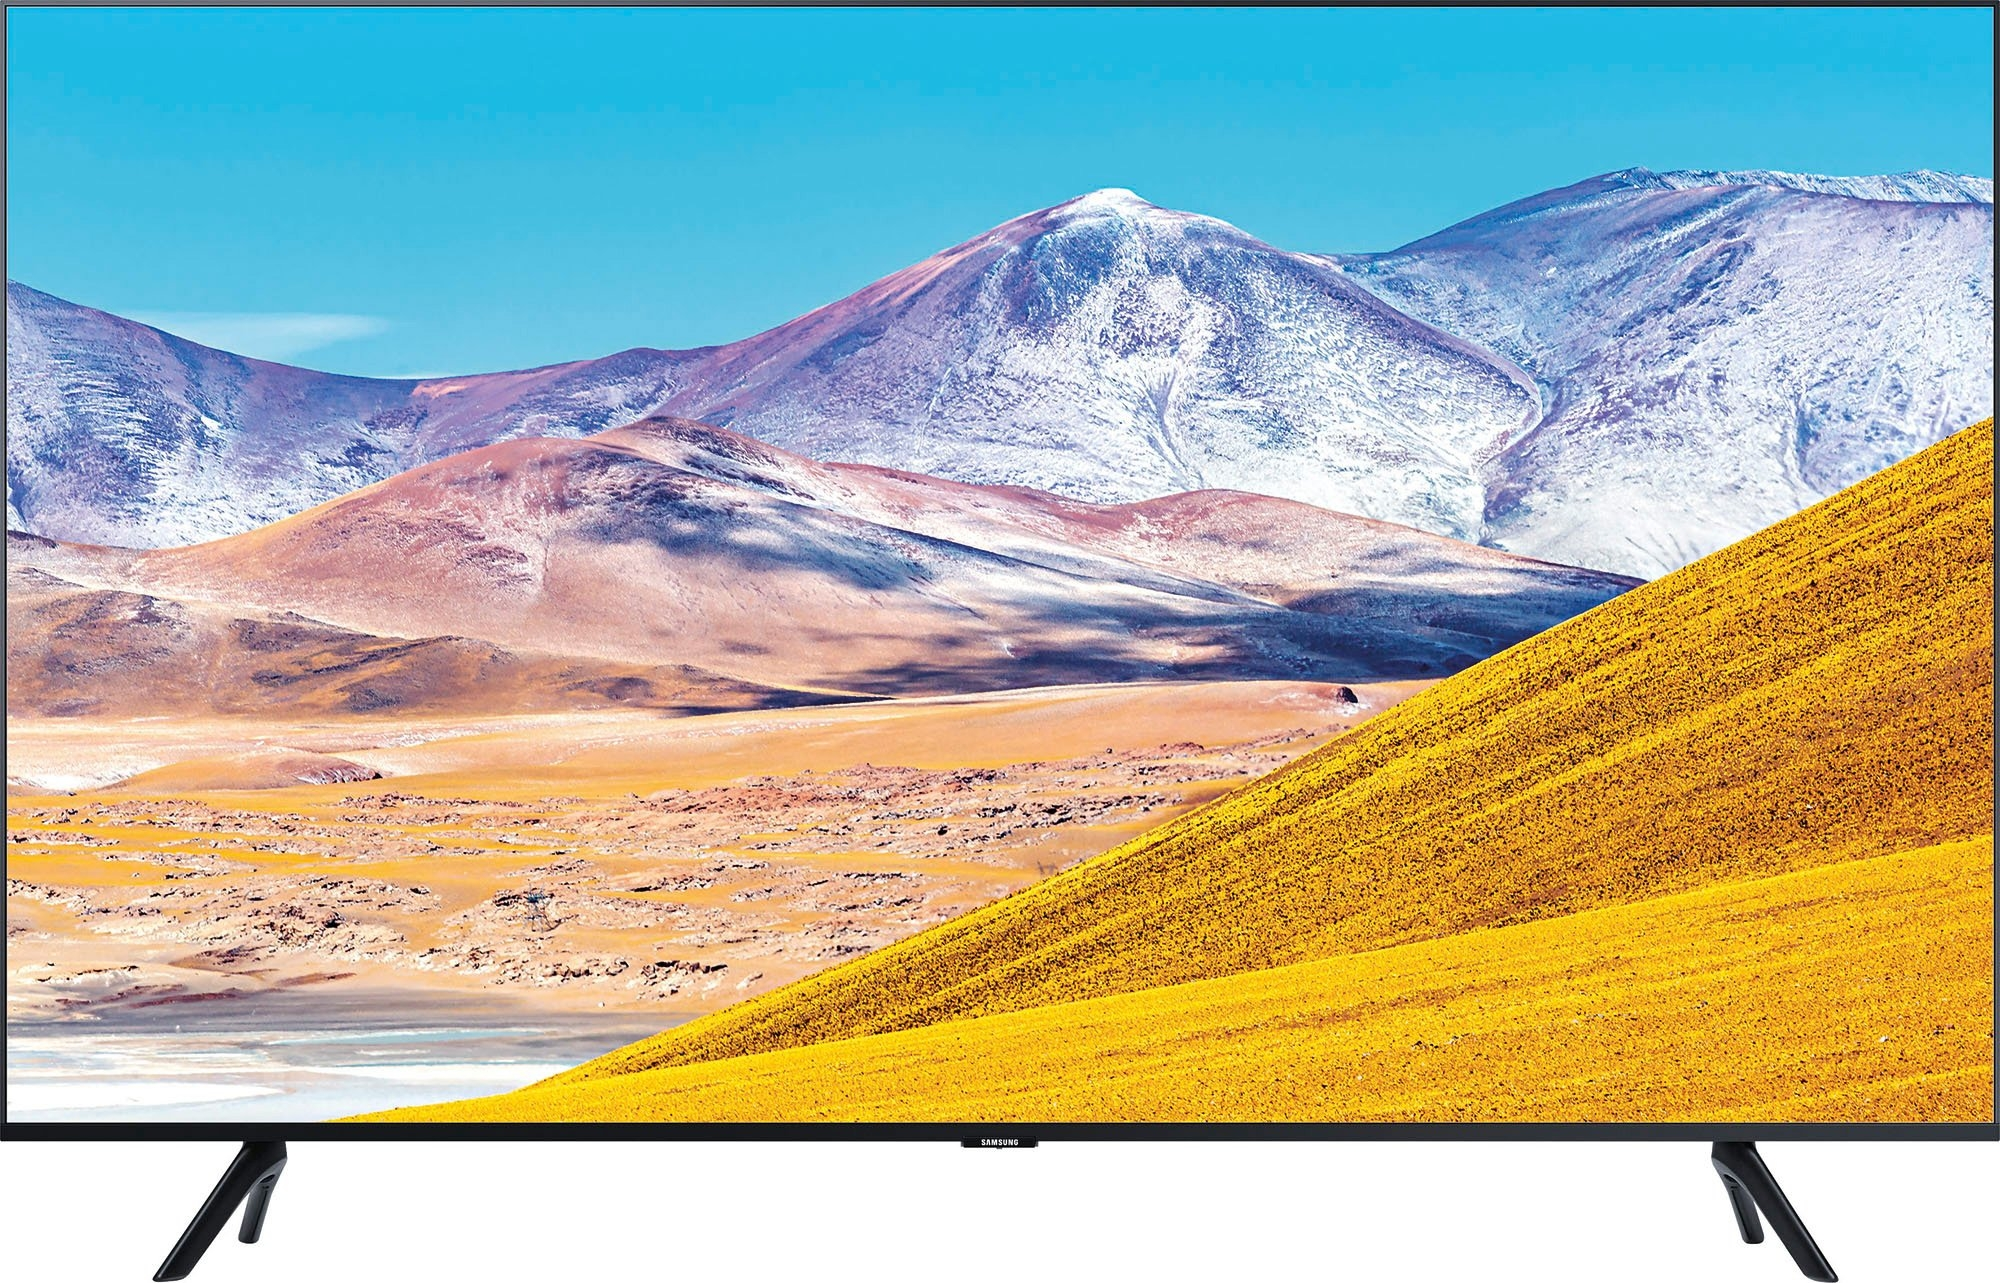 SAMSUNG »GU43TU8079« LED-TV nu online kopen bij OTTO